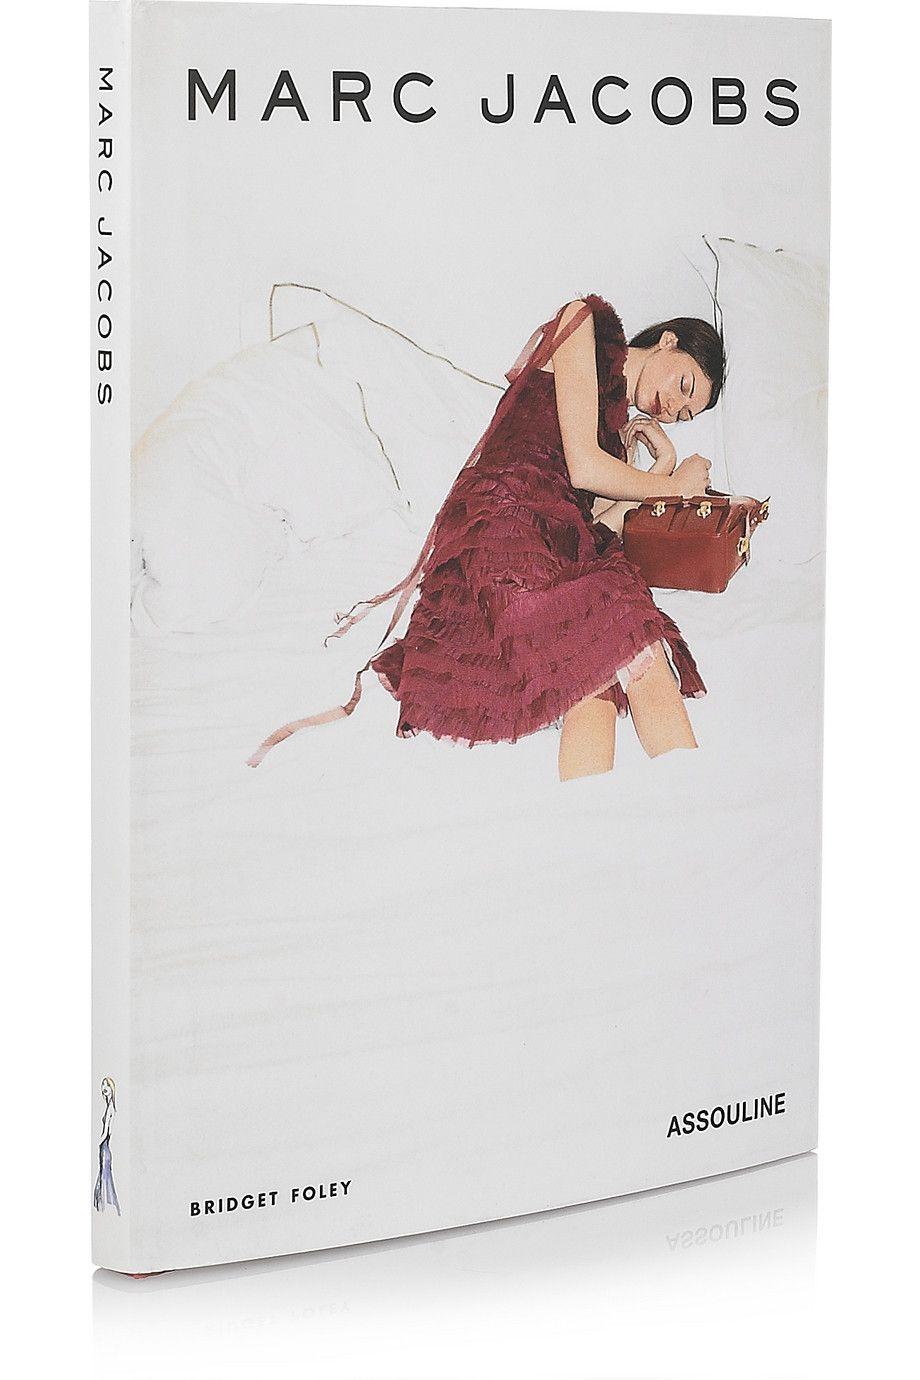 Assouline Books Marc Jacobs By Bridget Foley Hardcover Book